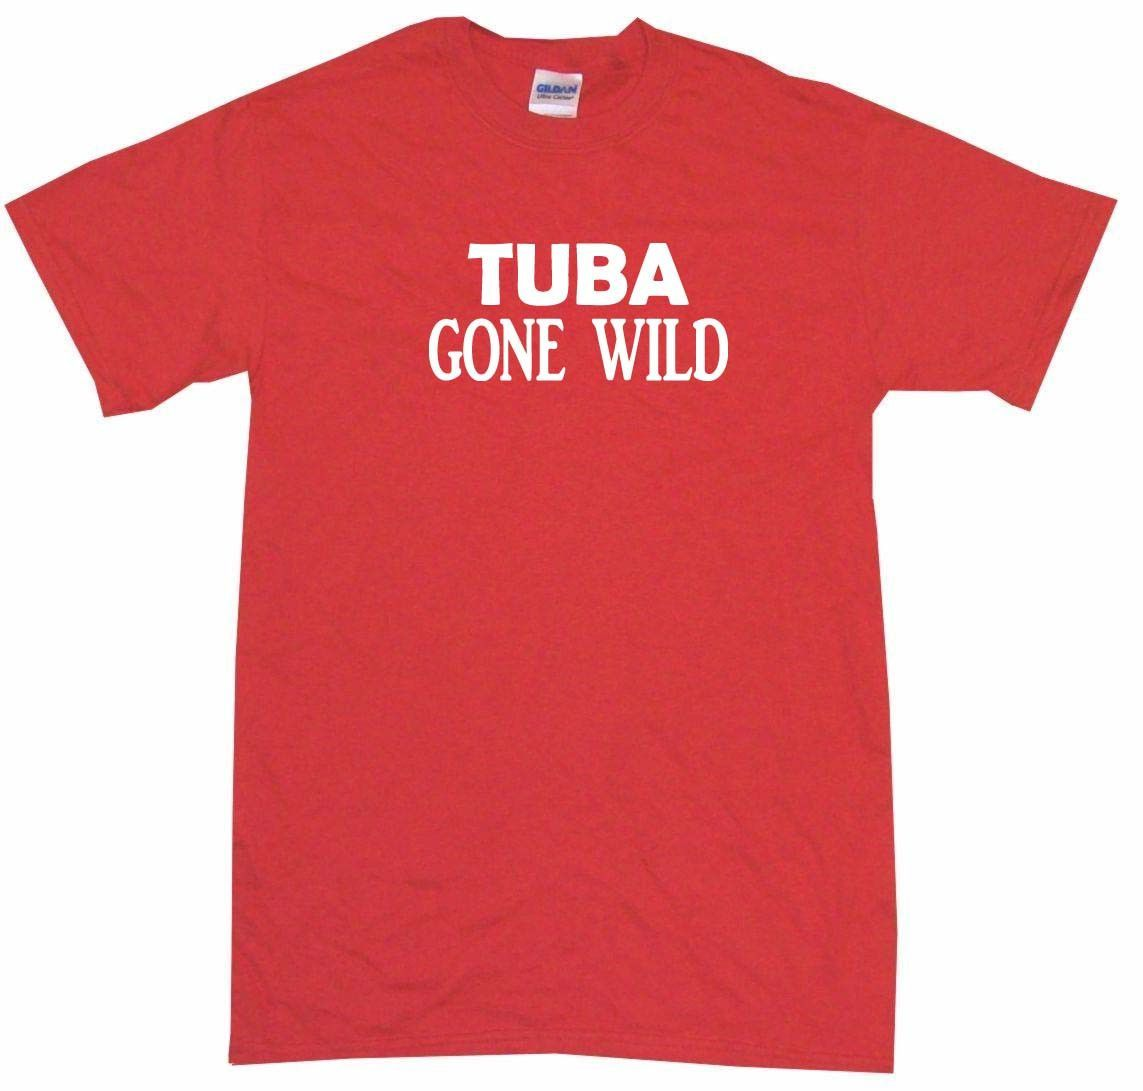 Tuba Gone Wild Tee Shirt OR Hoodie Sweat